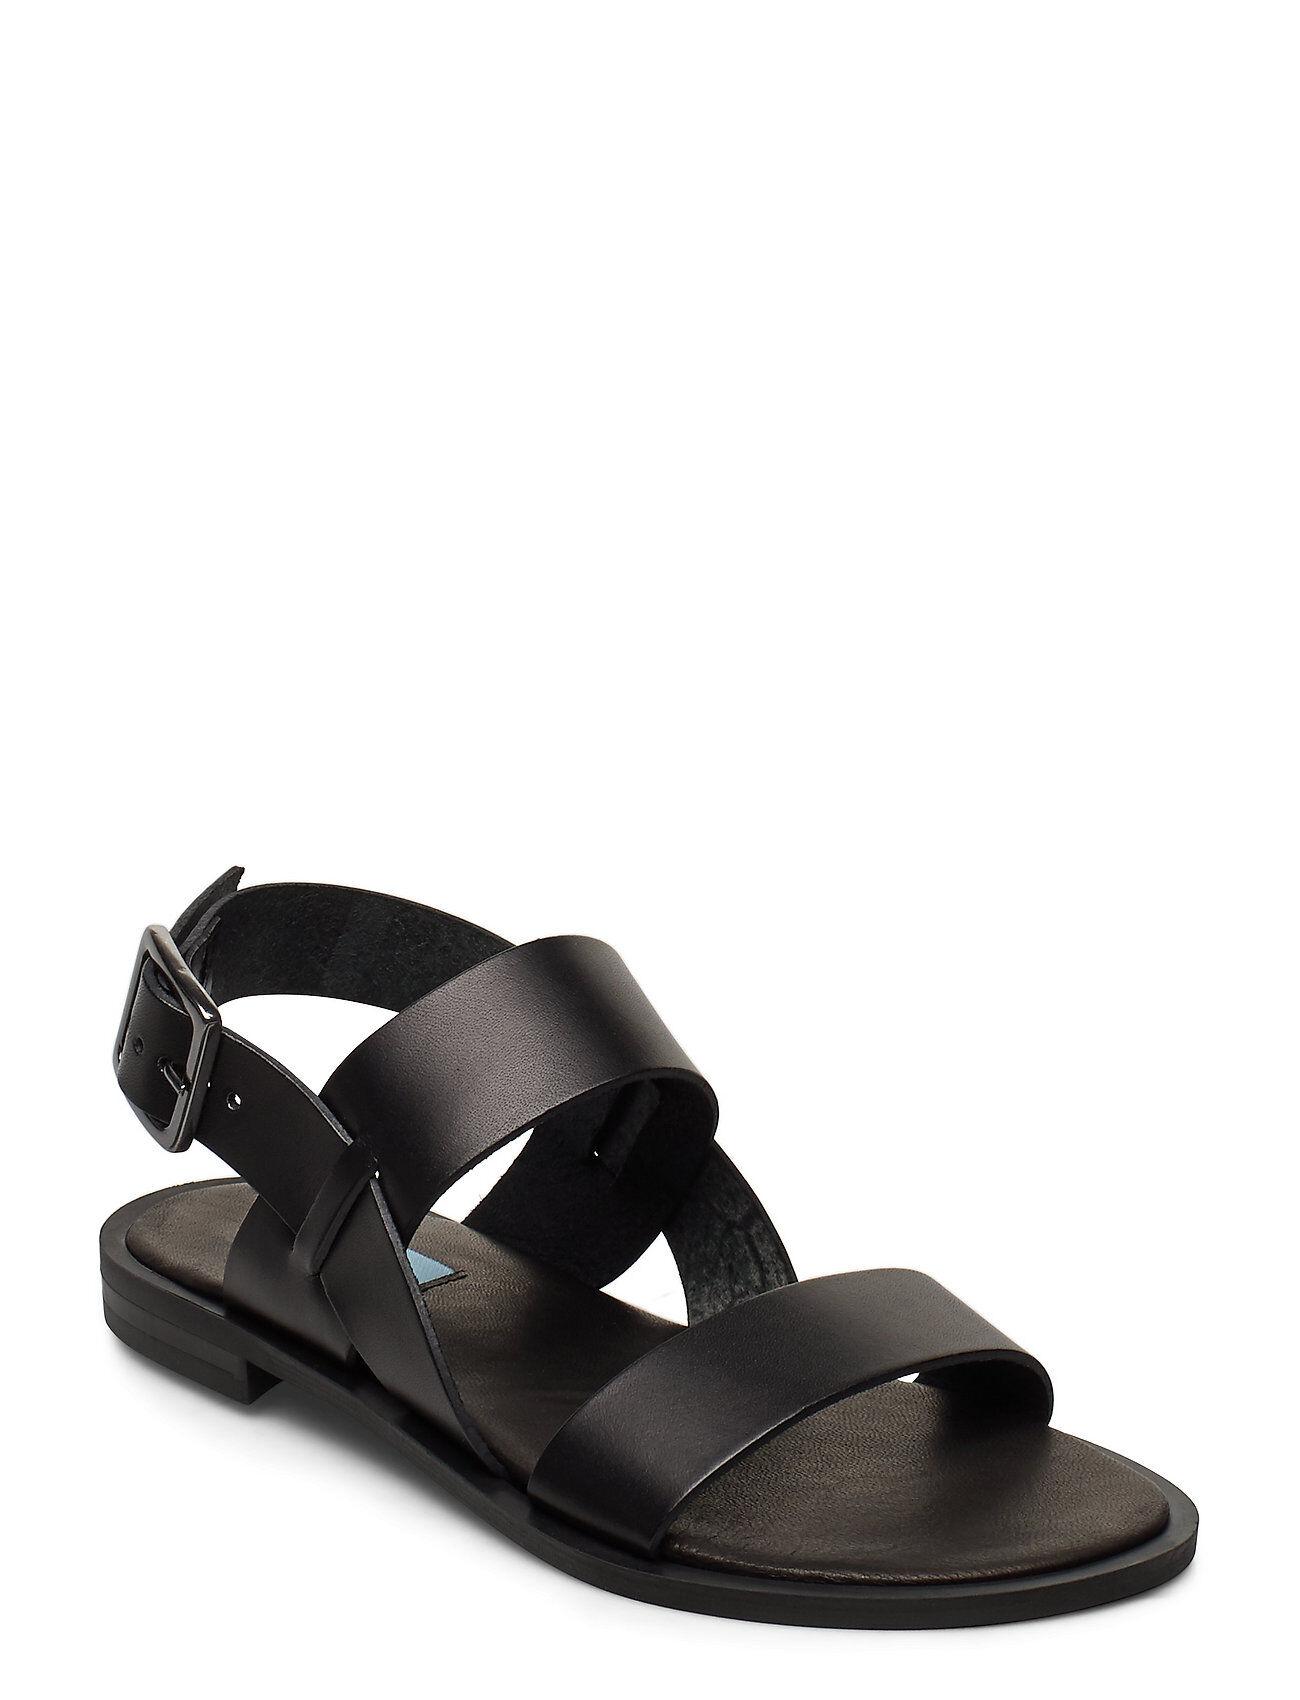 Apair 2 String Simple Round Shoes Summer Shoes Flat Sandals Musta Apair